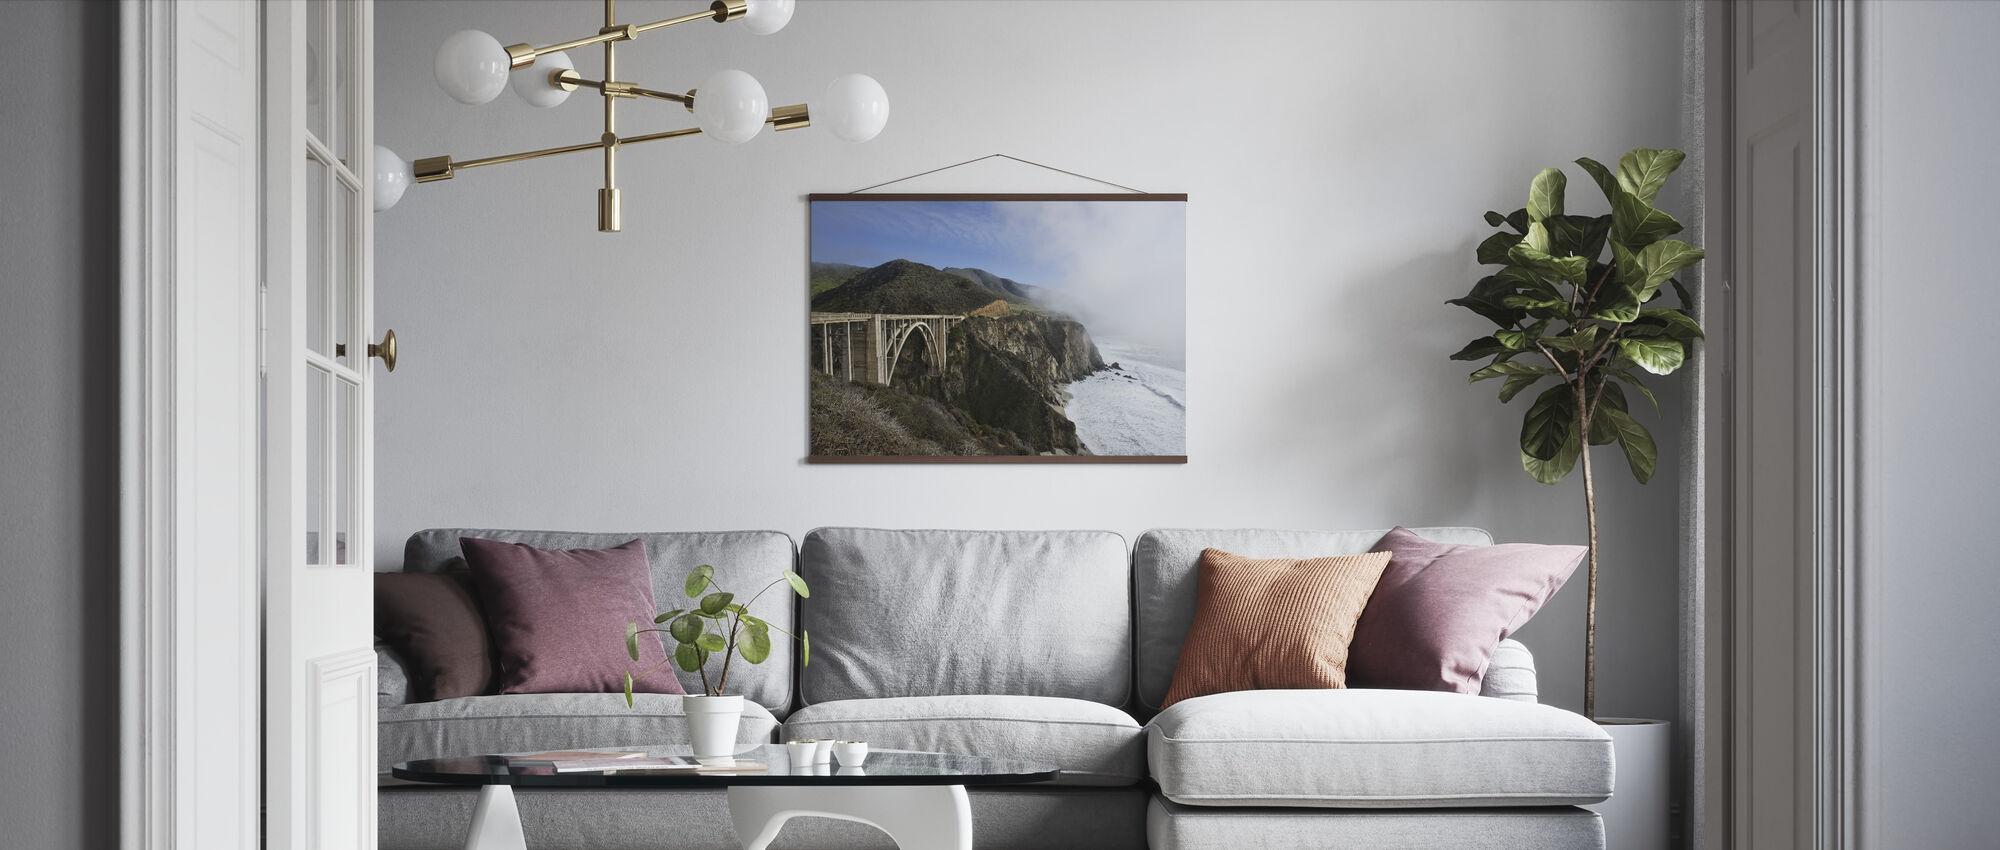 Californian Waves at Bixby Bridge - Poster - Living Room